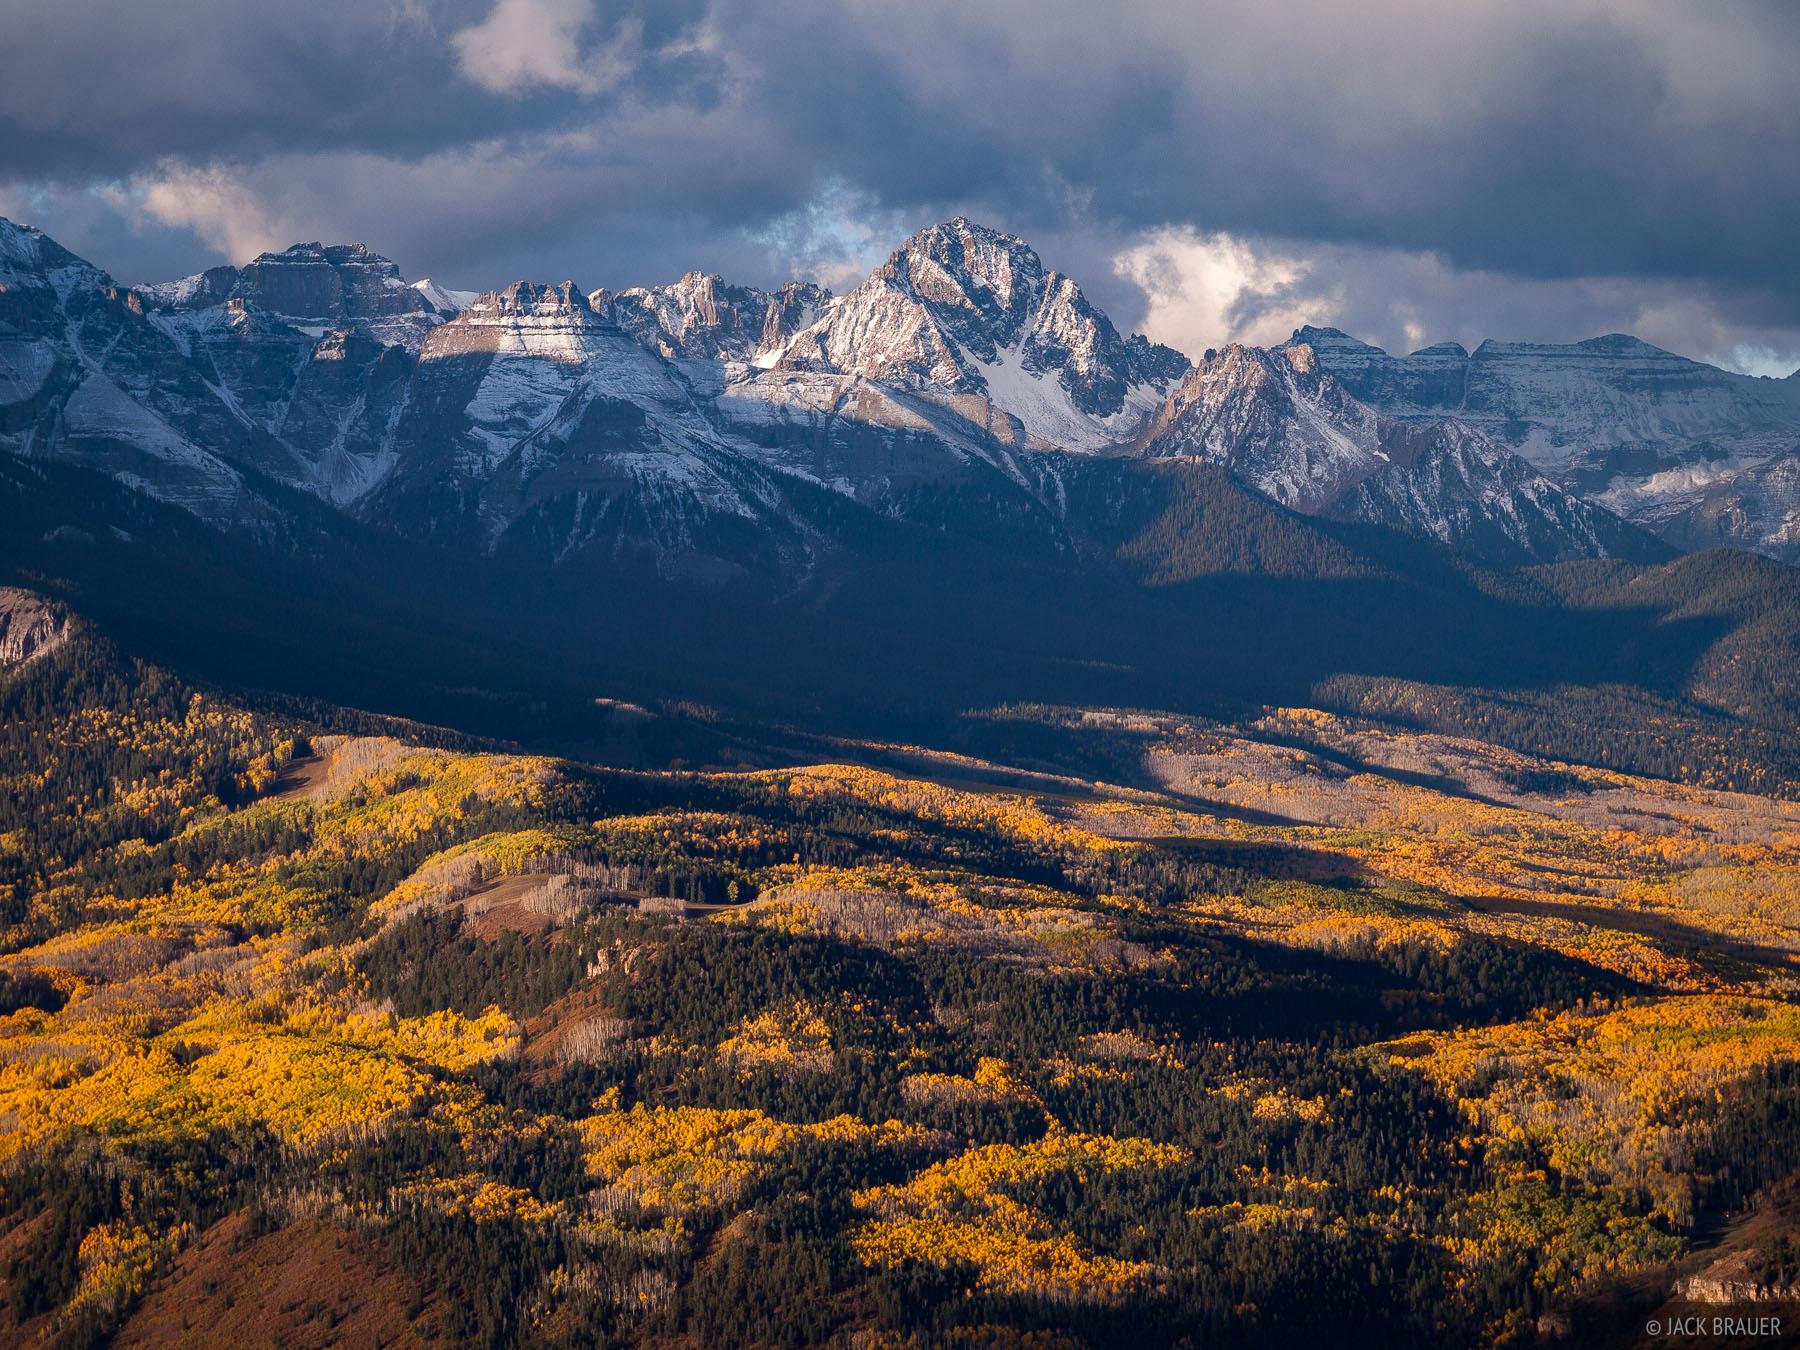 Colorado,Mt. Sneffels,San Juan Mountains,Sneffels Range,autumn,fall, aspens, photo